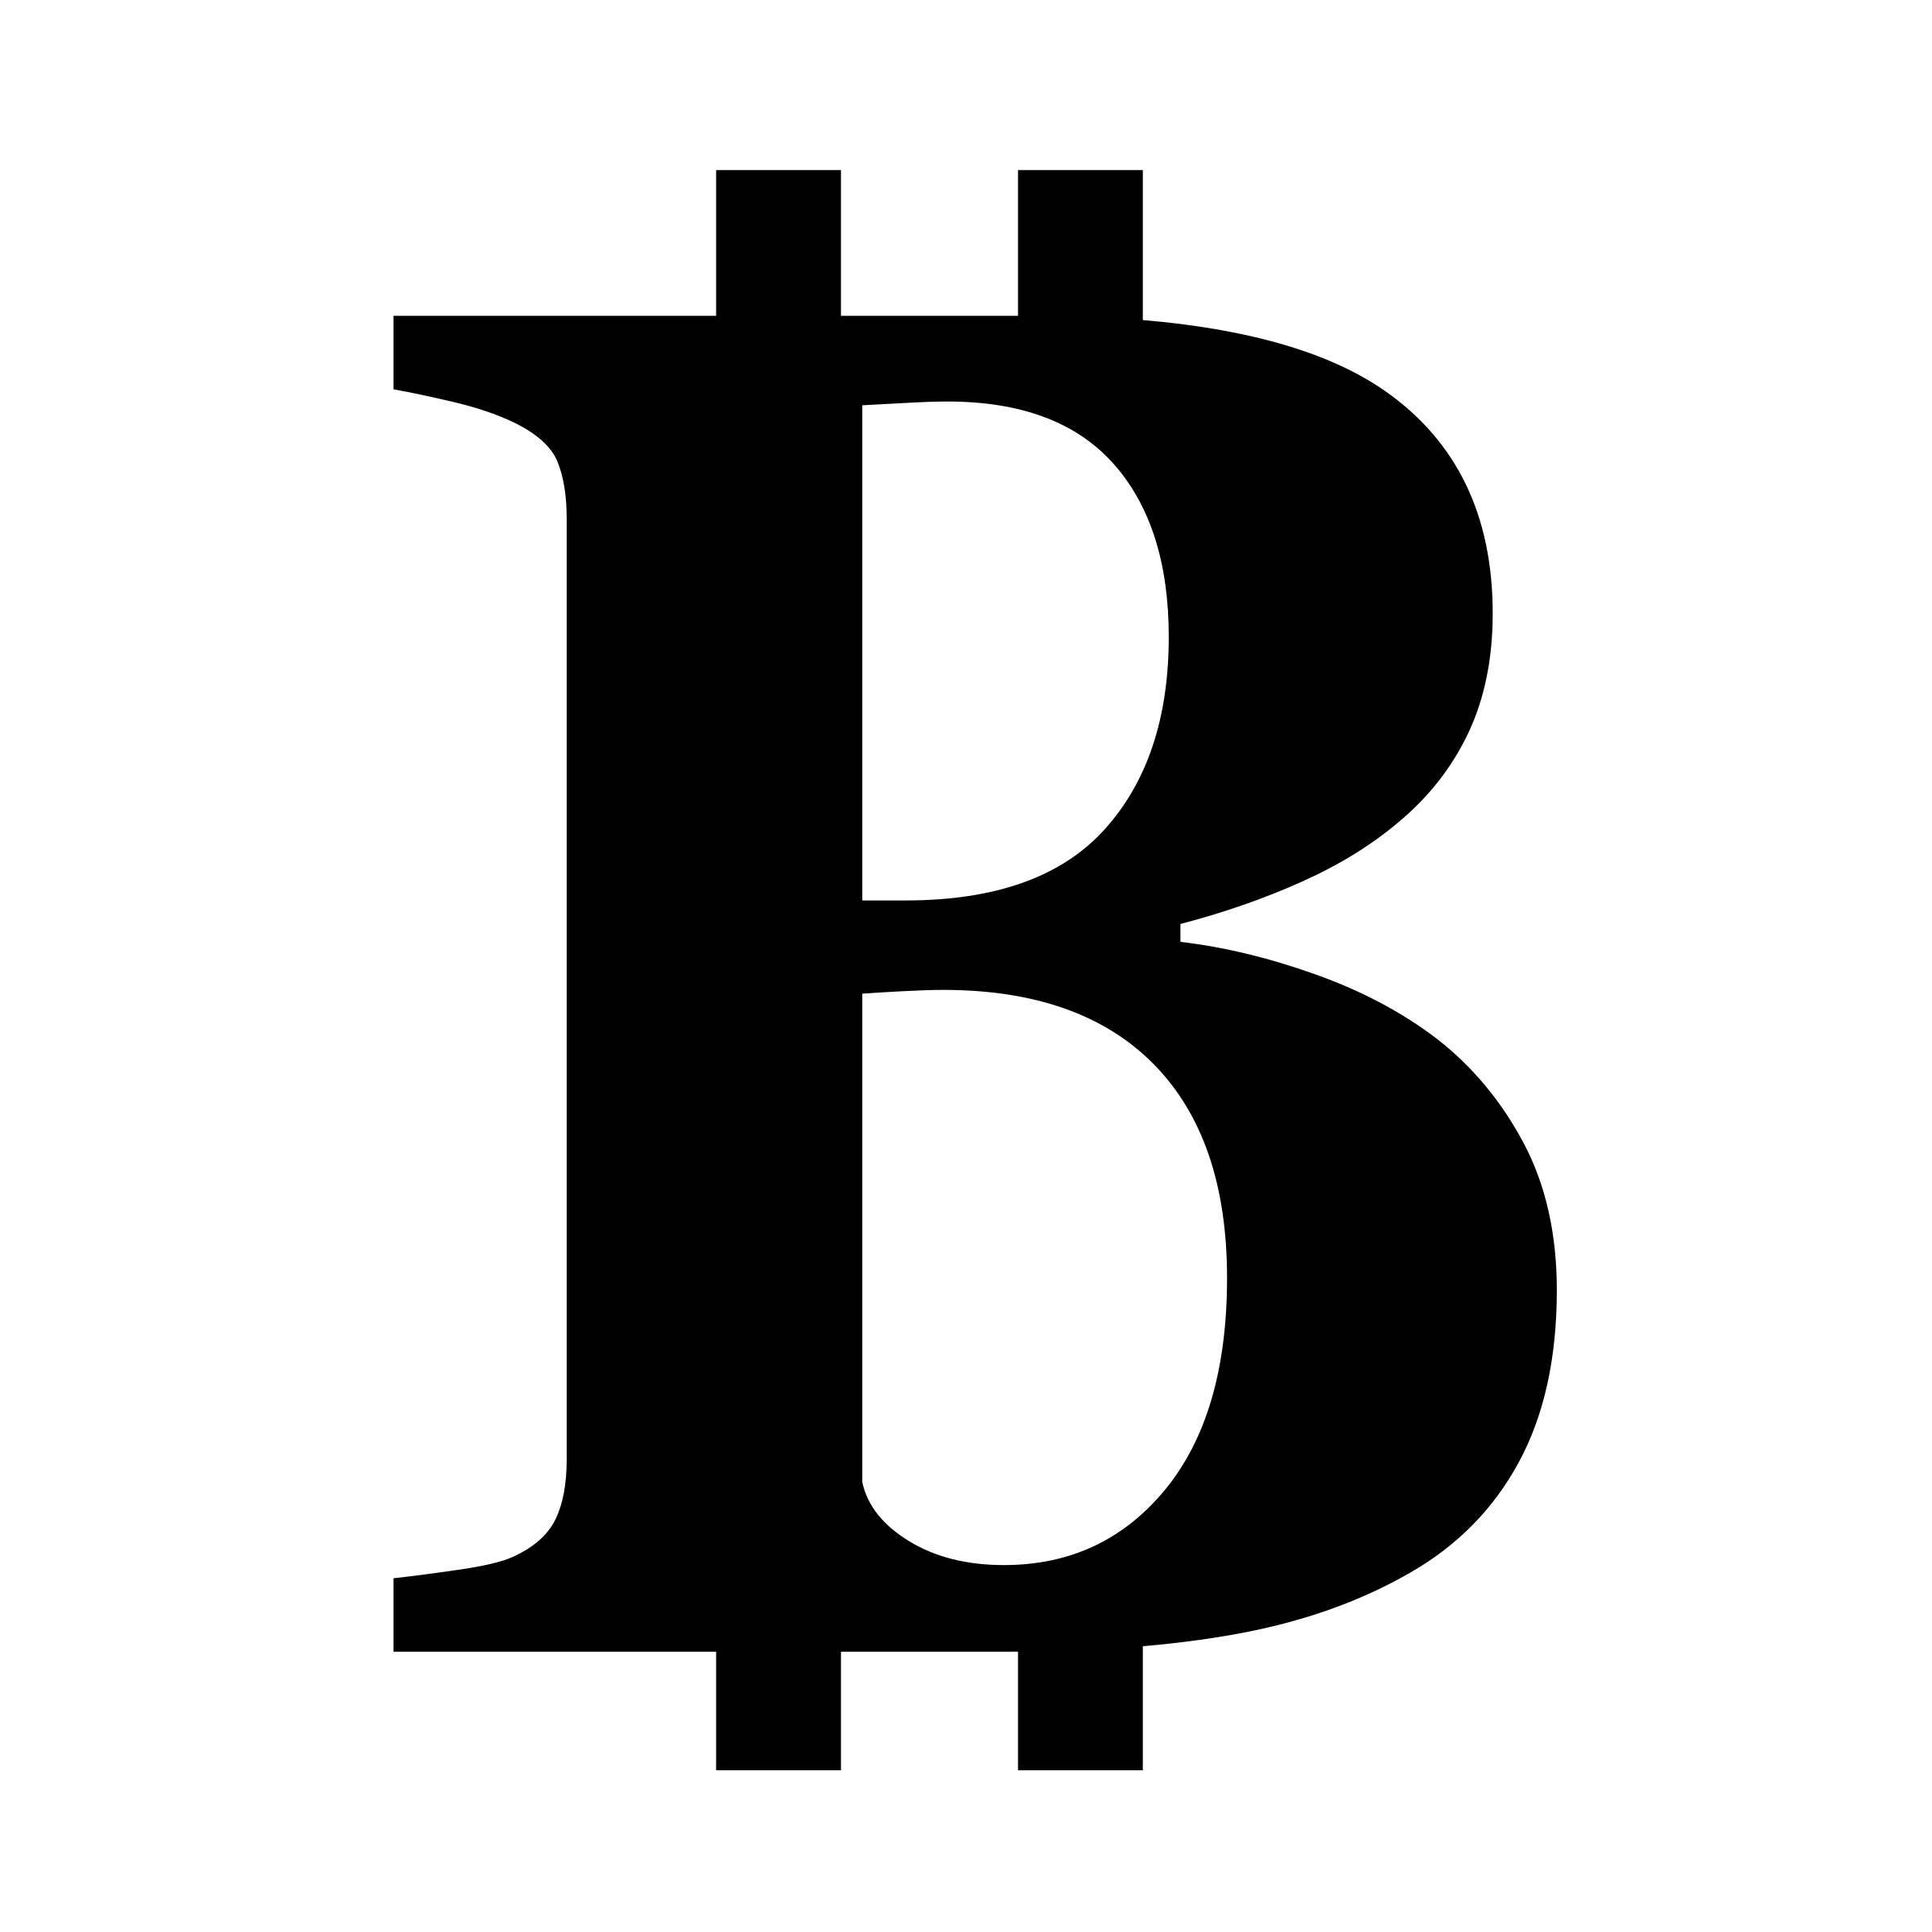 Bitcoin Symbol Dxf Svg Ai Pdf Eps Png Jpg And Wmf Print Files